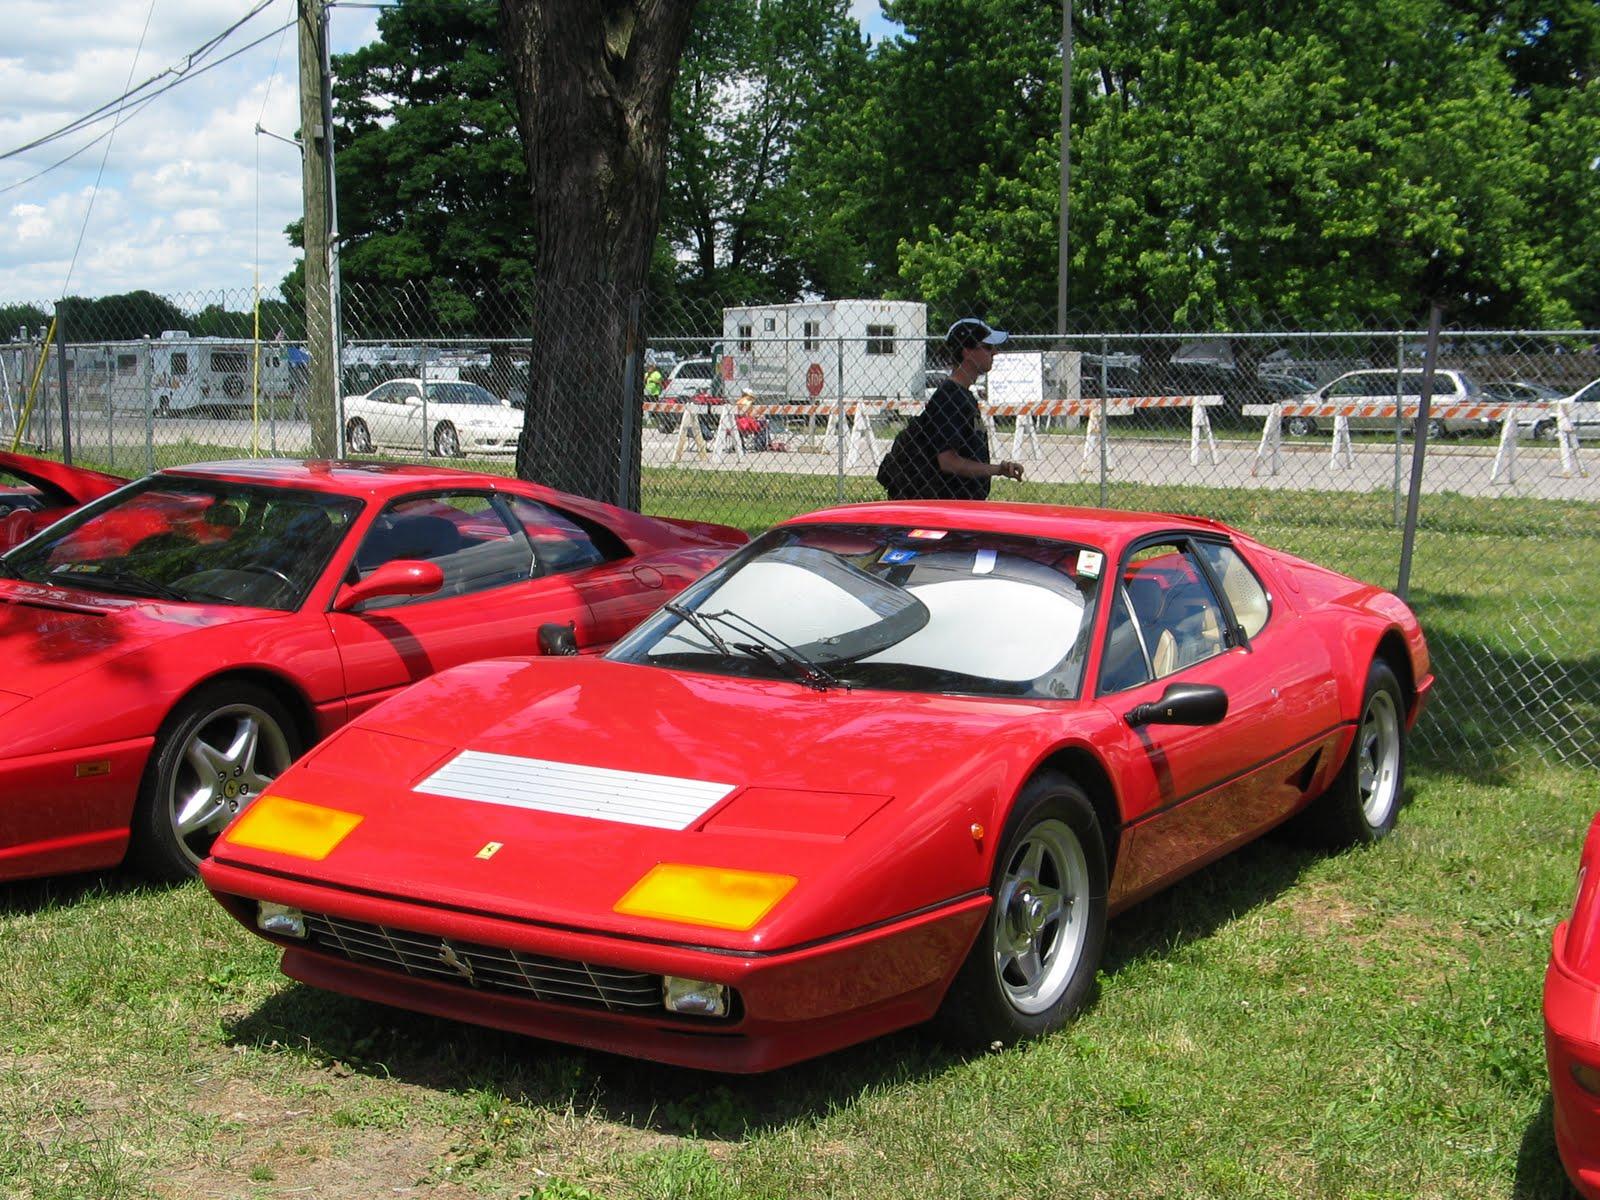 http://2.bp.blogspot.com/-ZxN6gNQdneU/TjAJyXALBbI/AAAAAAAAAvQ/y3ERs0EpvI0/s1600/Ferrari_Berlinetta_Boxer.jpg